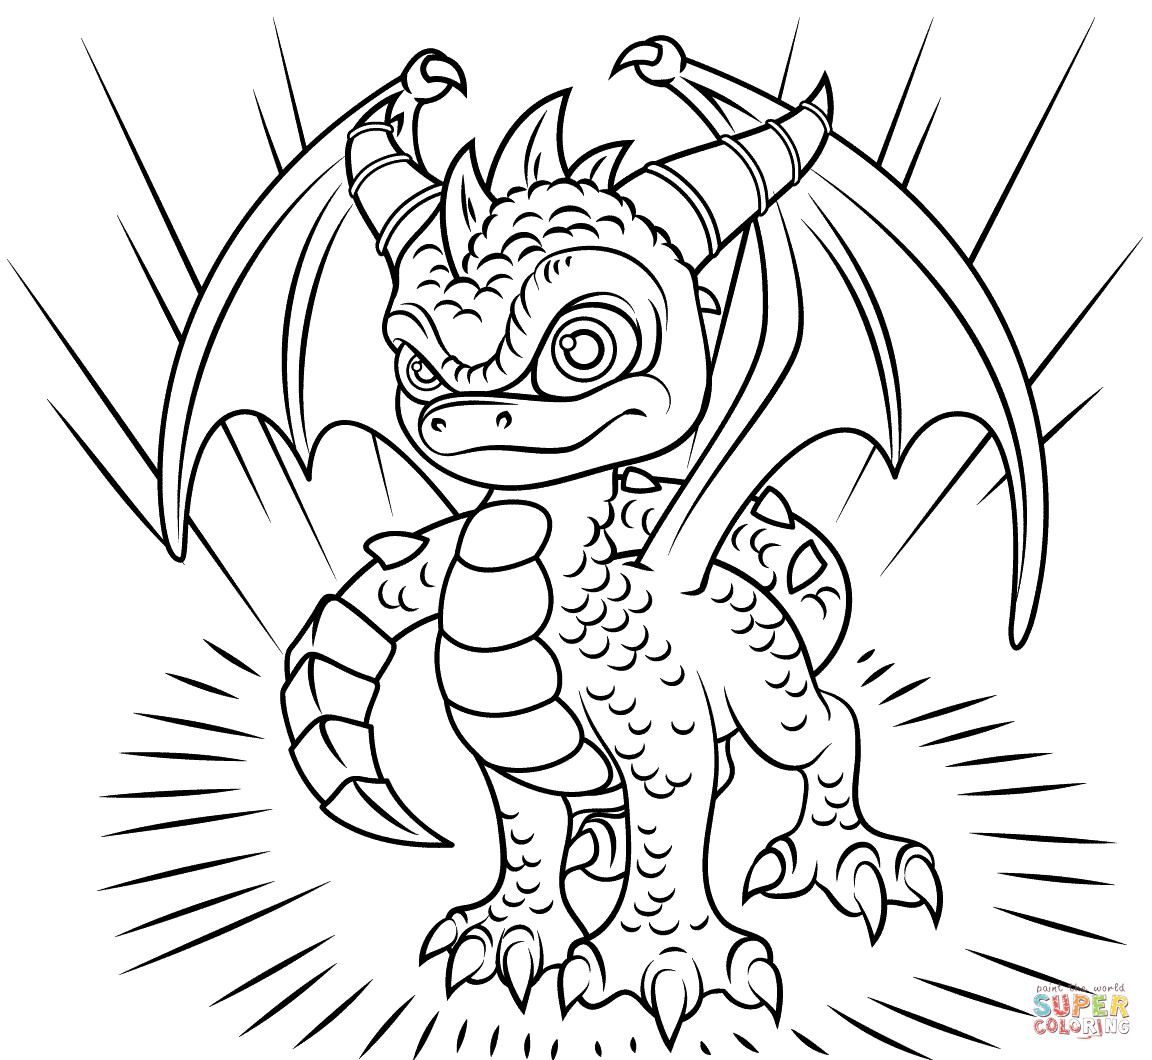 Best ideas about Skylanders Giants Printable Coloring Pages . Save or Pin Skylanders Spyro coloring page Now.